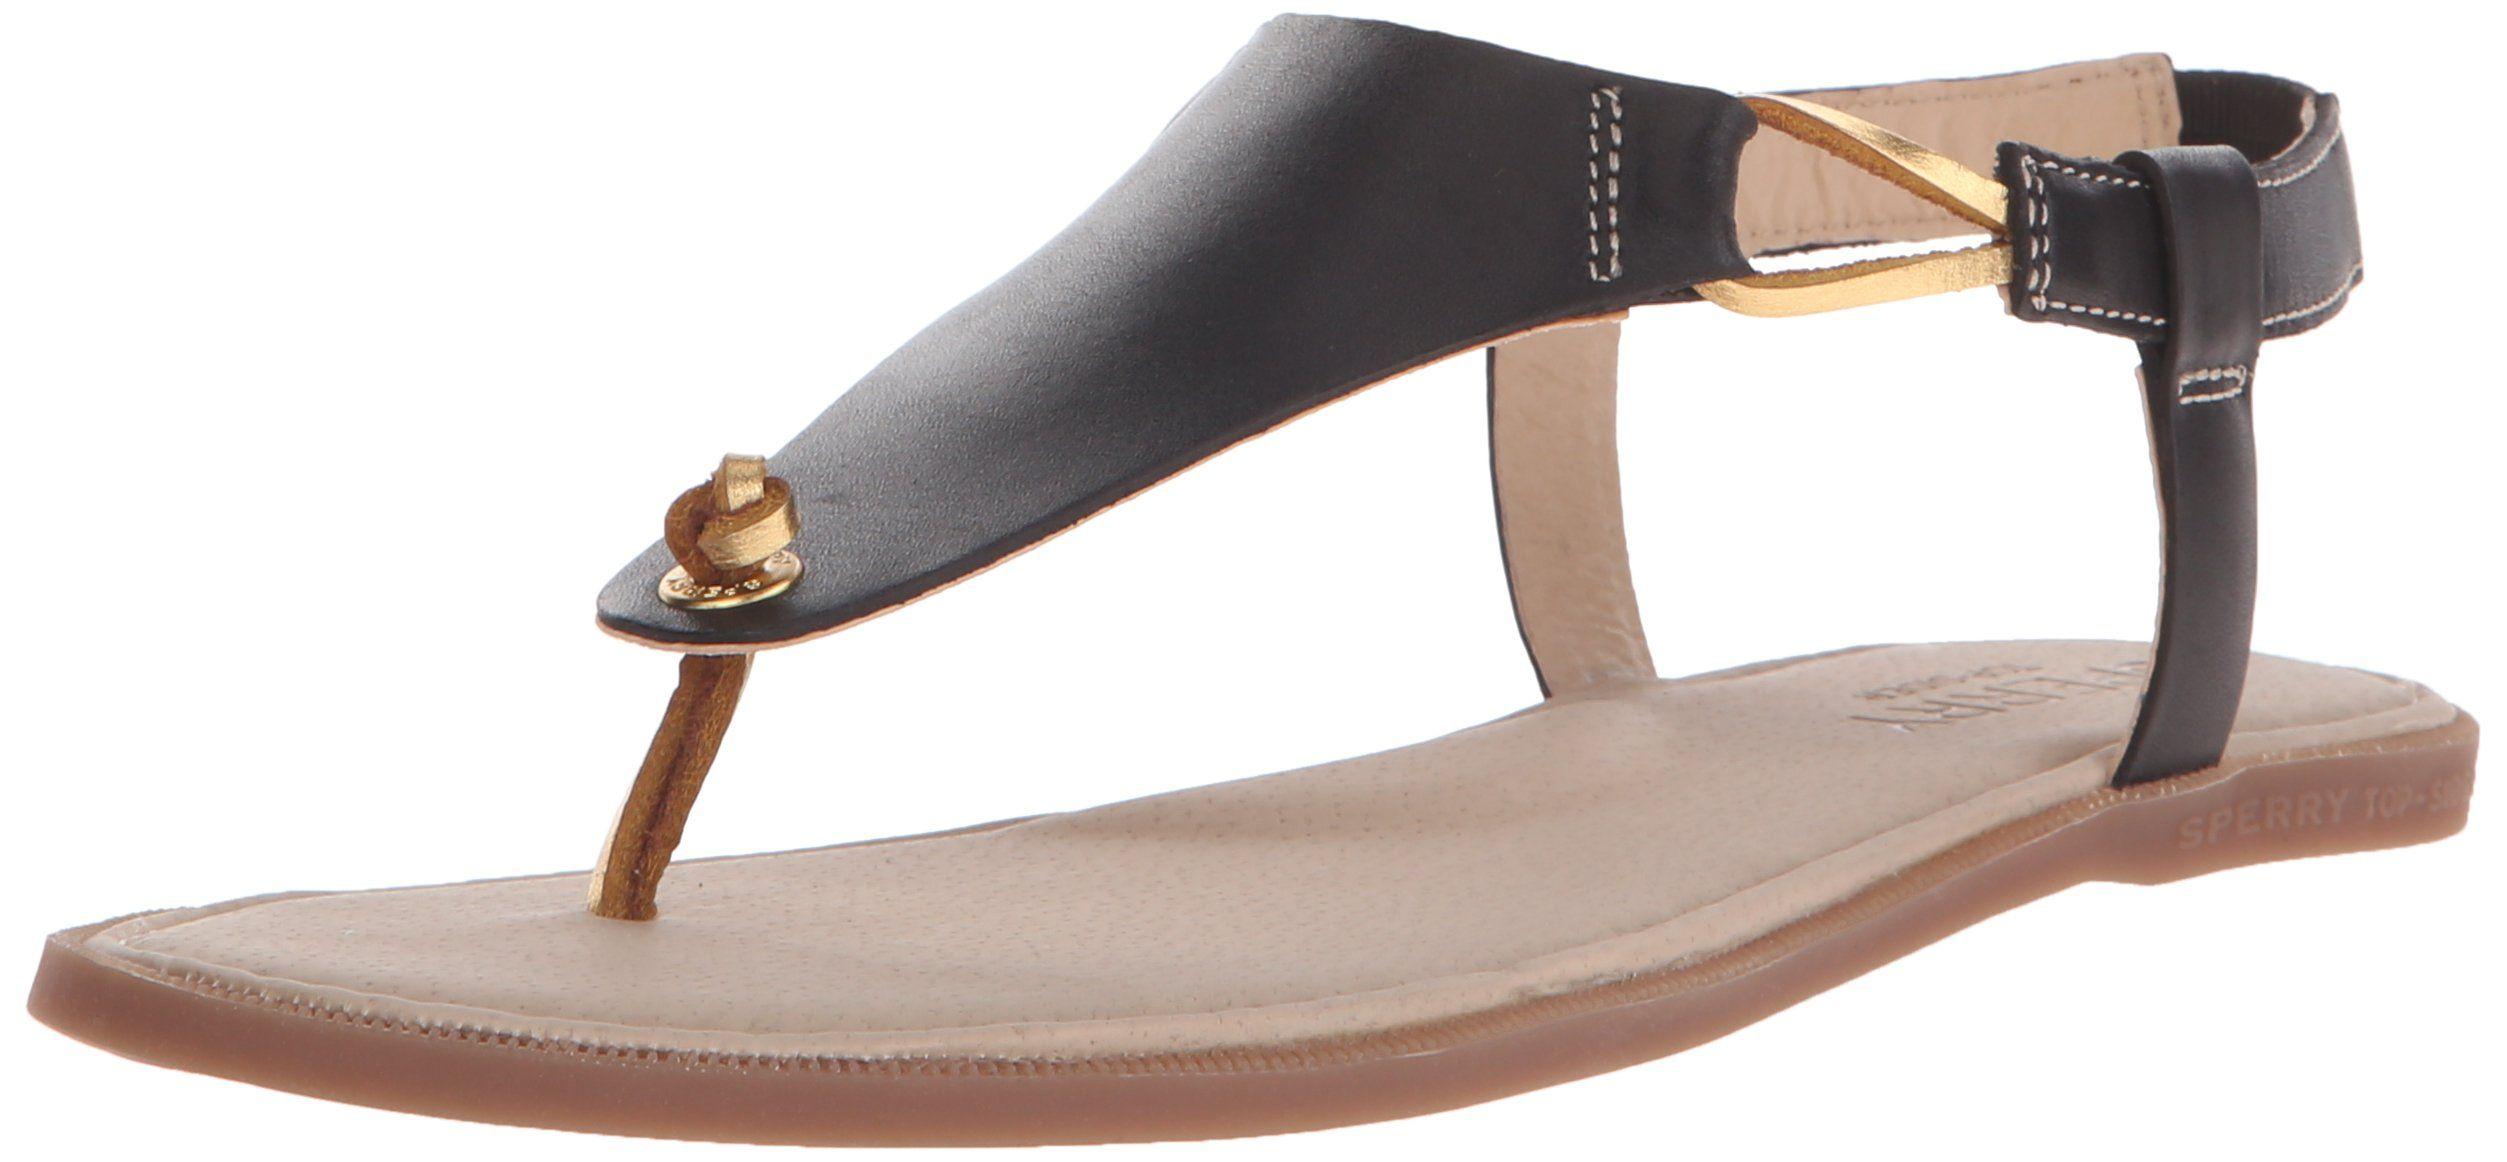 ec0df488e7c5 Sperry Top-Sider Women s Calla Jade Flat Sandal